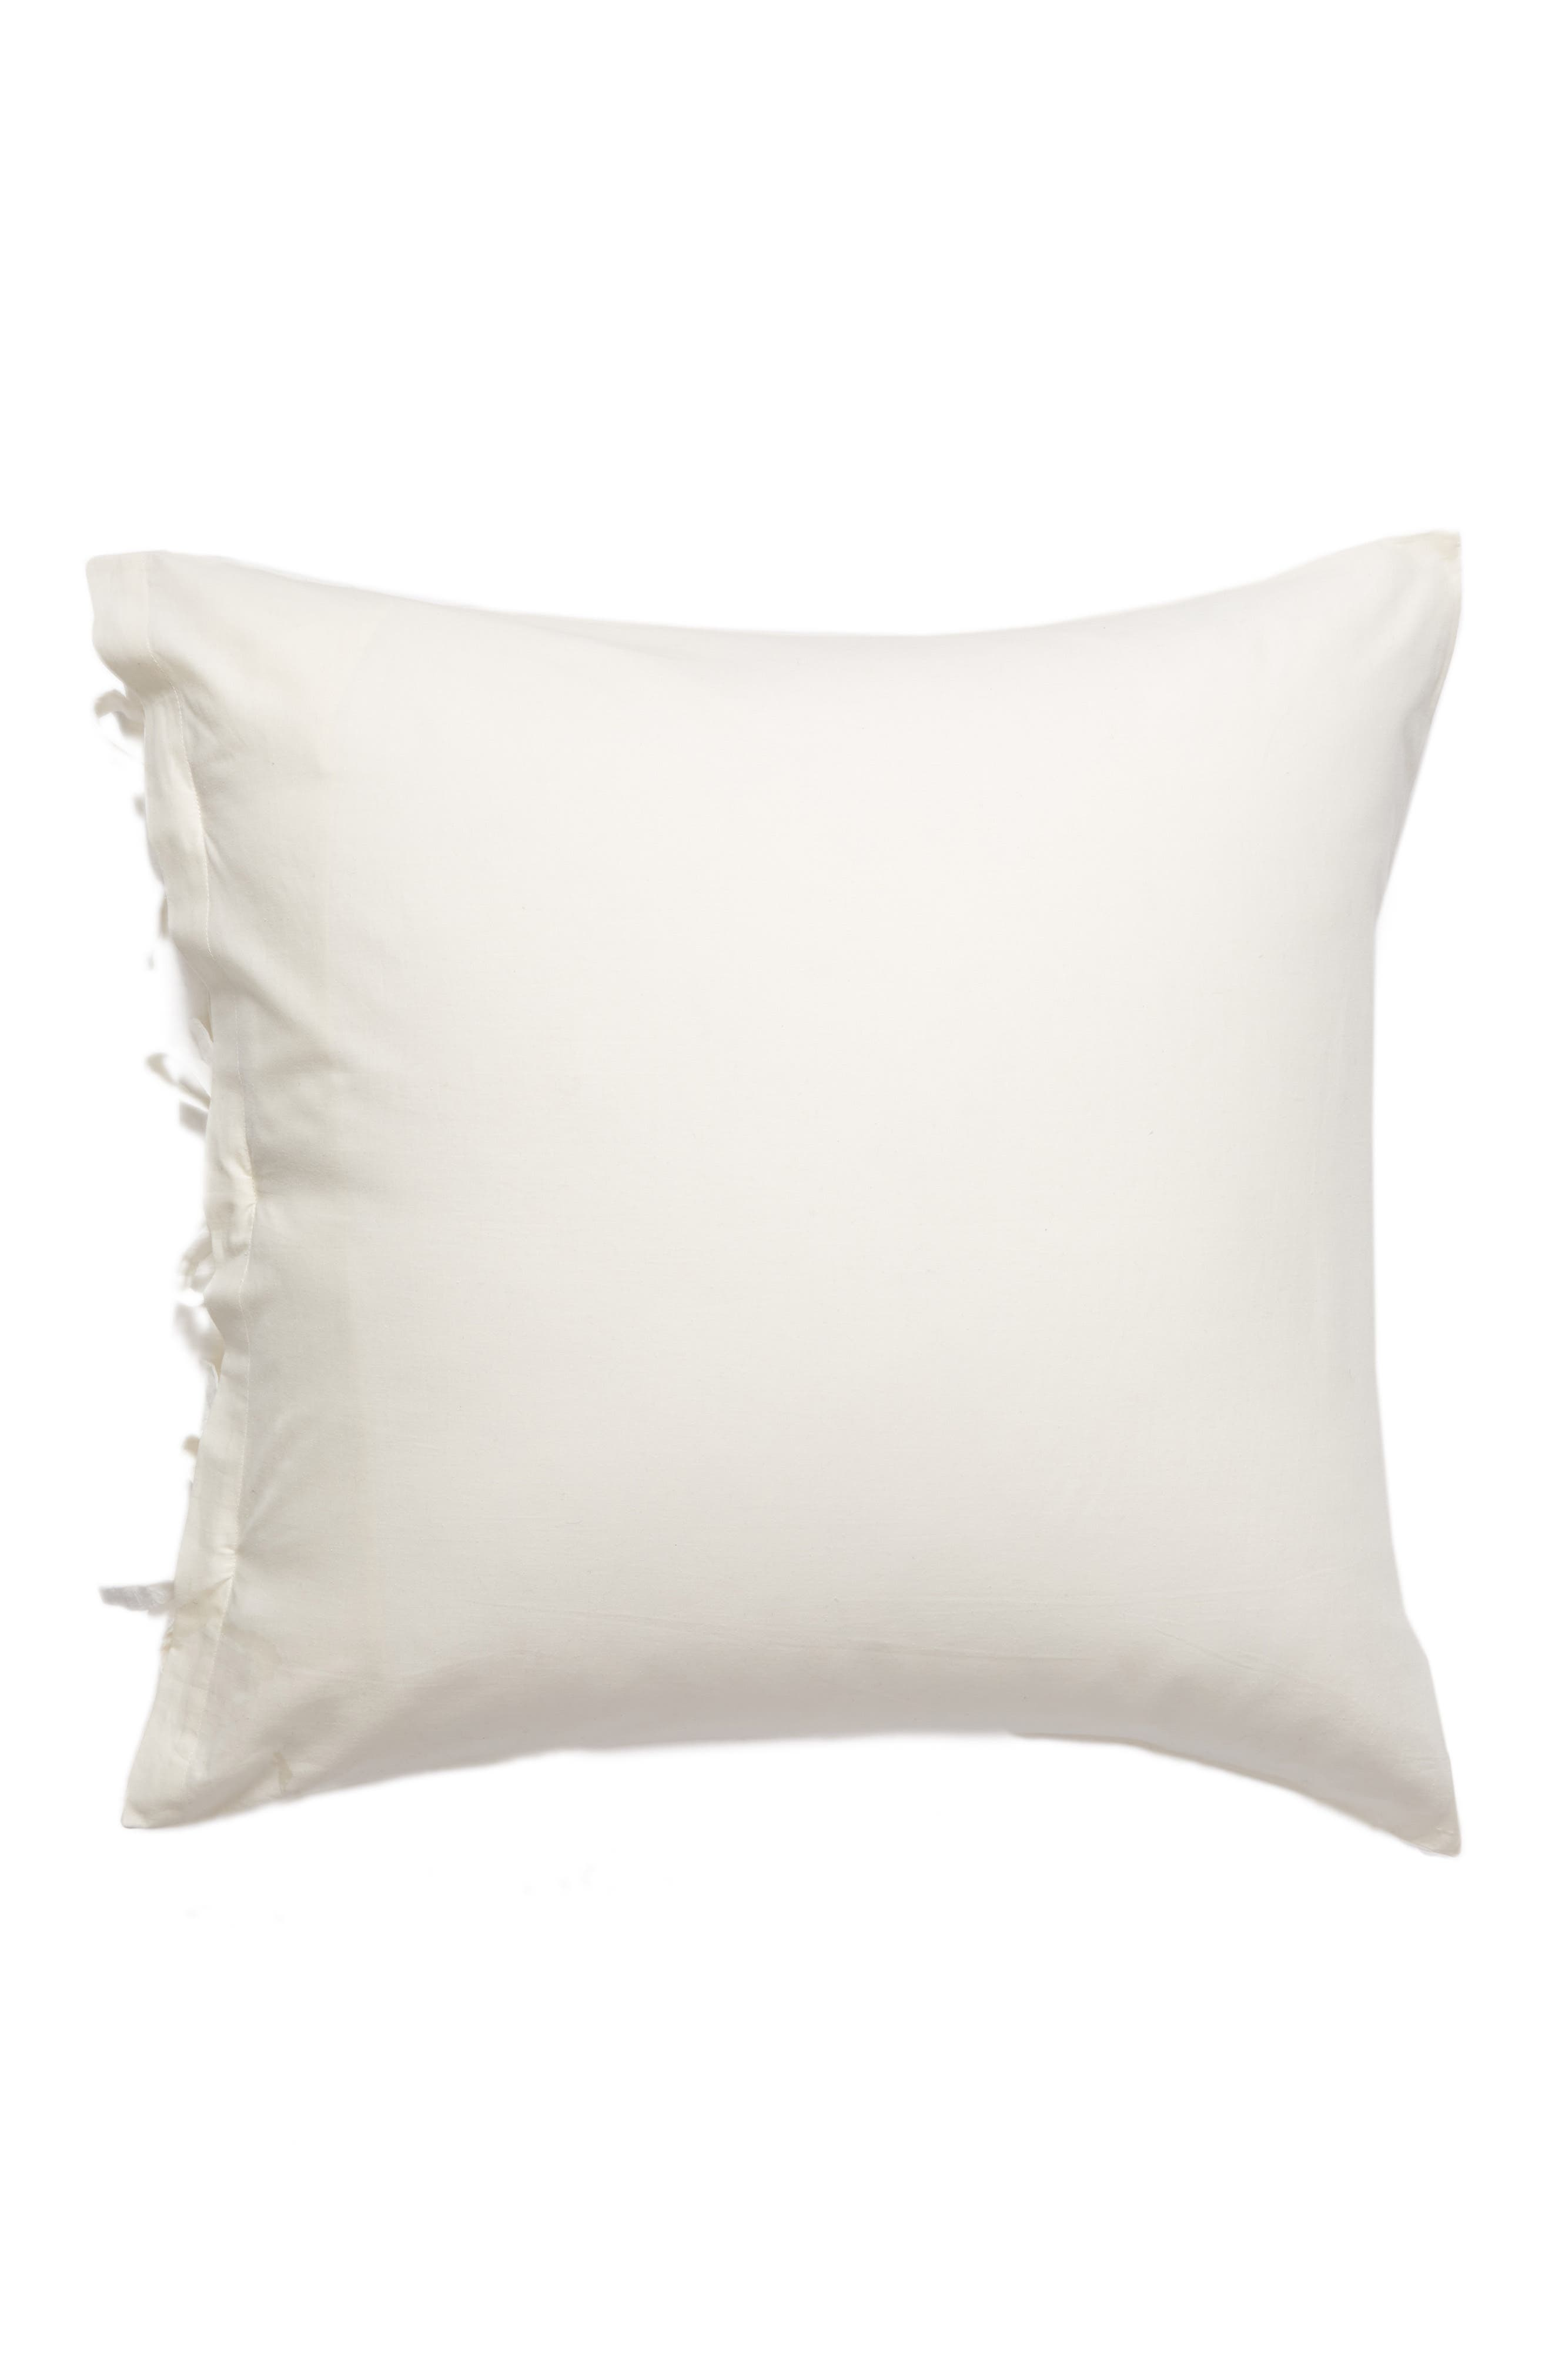 Relaxed Cotton & Linen Euro Sham,                             Alternate thumbnail 2, color,                             Ivory